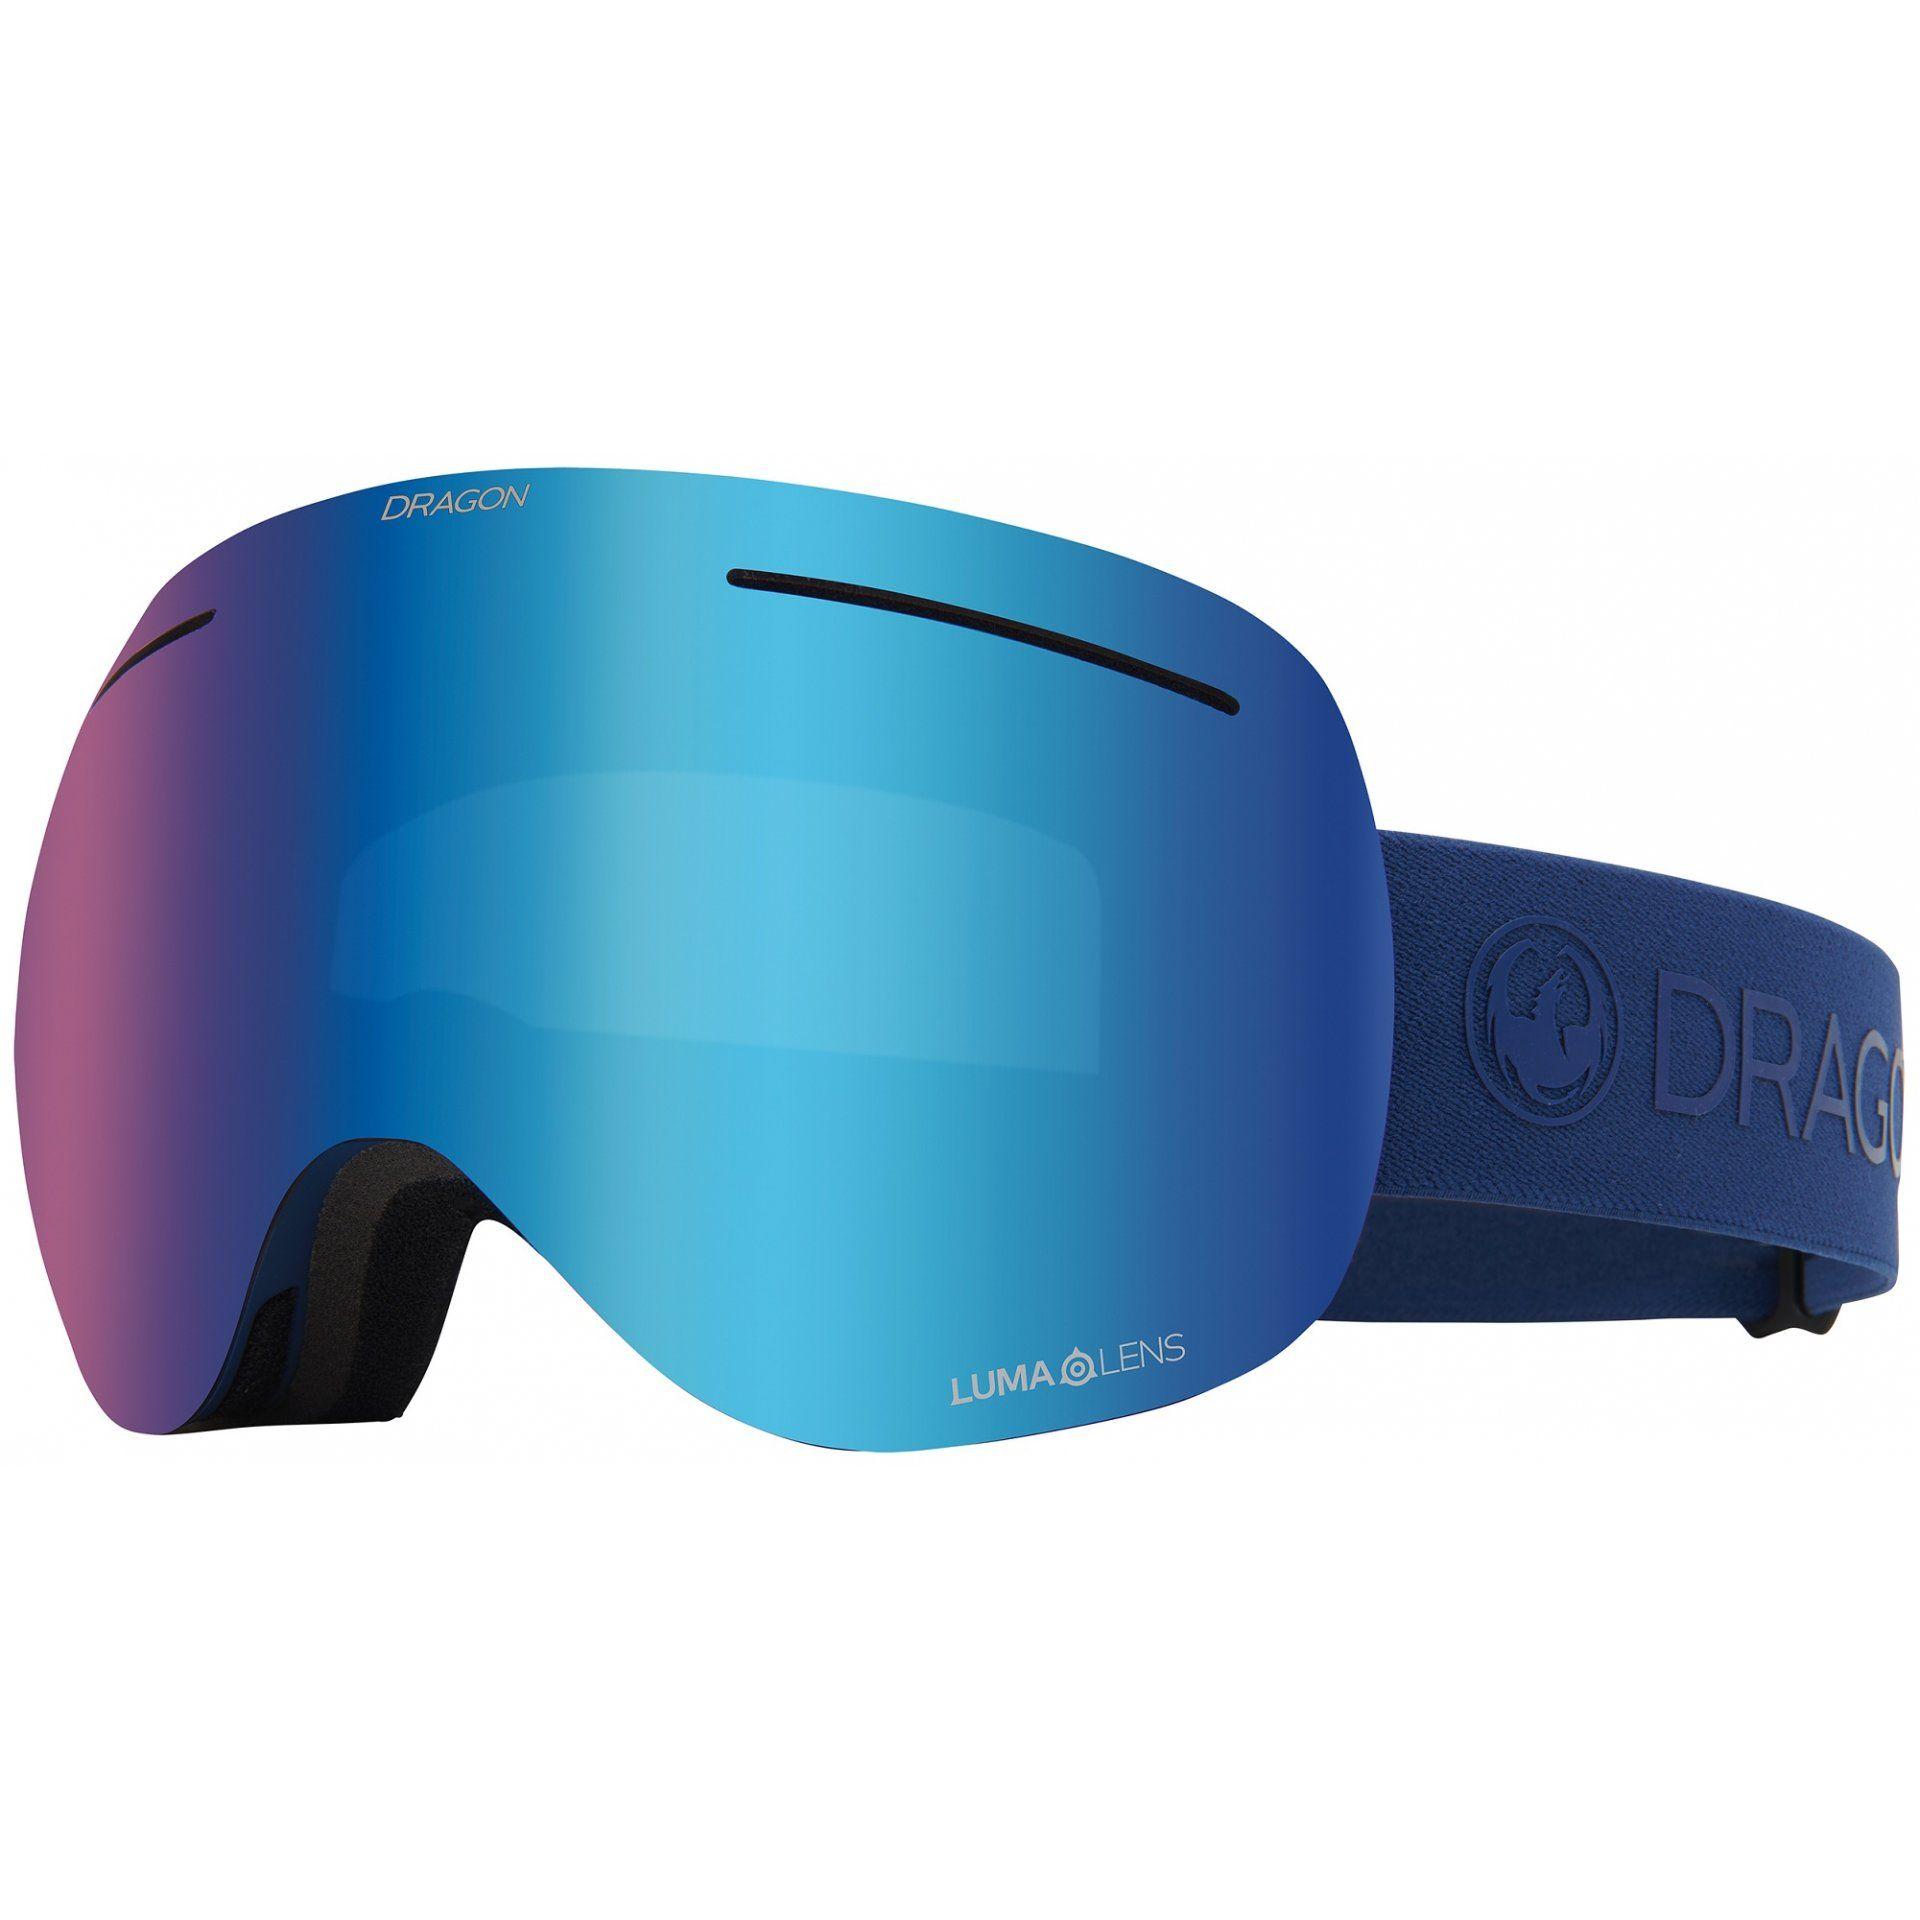 GOGLE DRAGON X1 NAVY BLUE ION